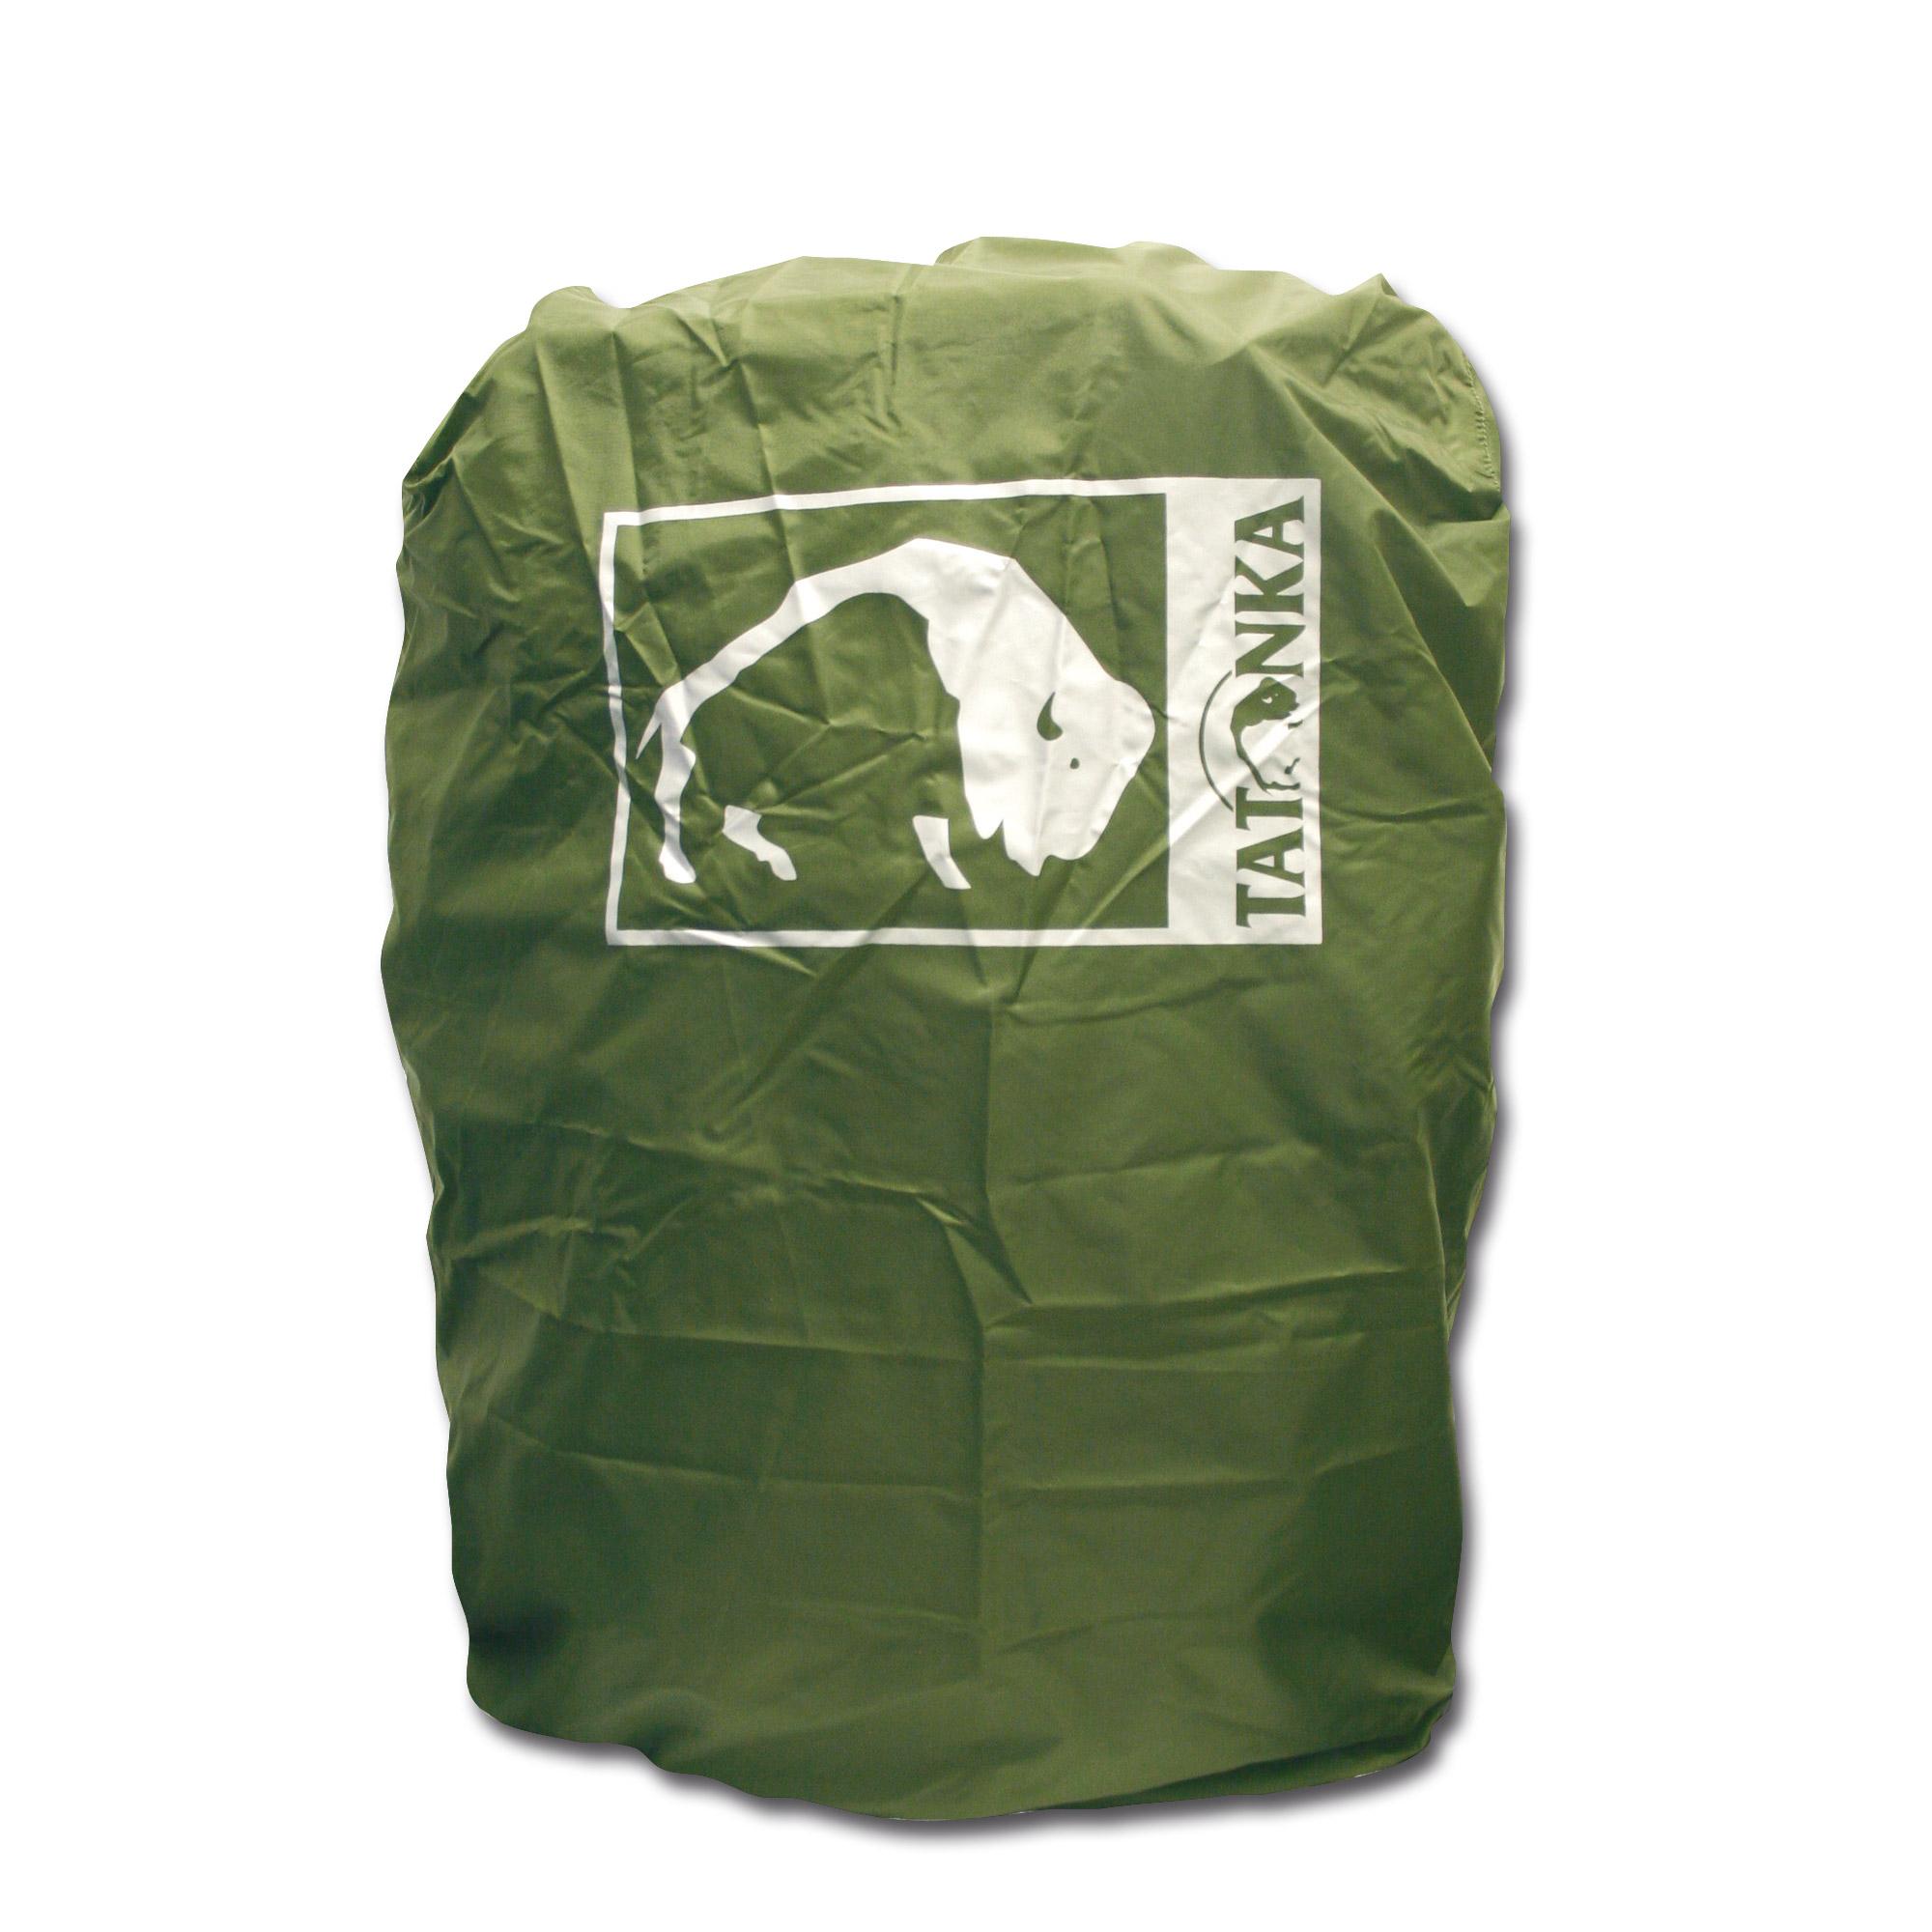 Backpack Cover Tatonka Medium olive